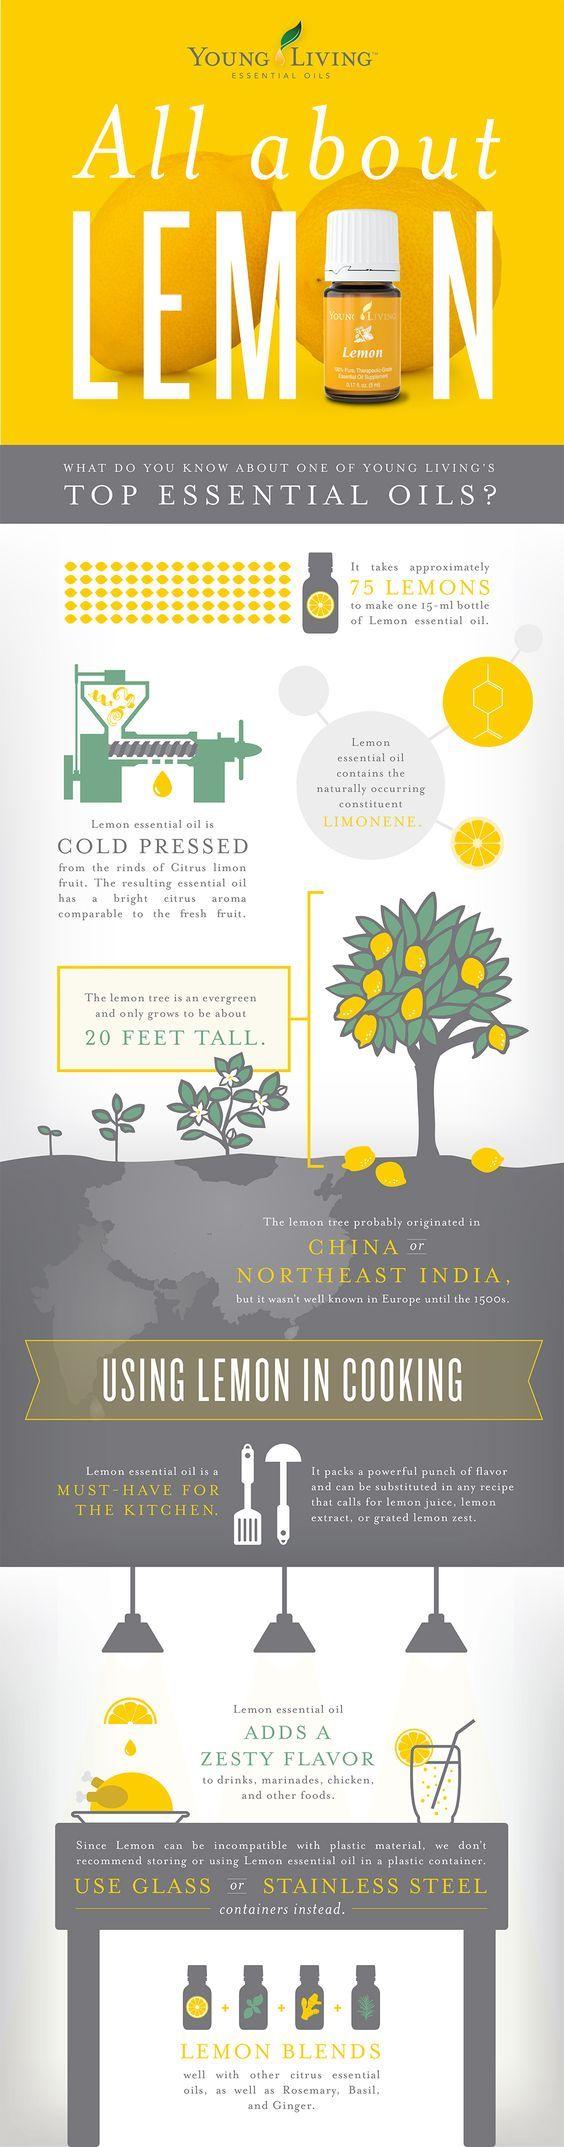 Fun facts about Lemon essential oil!